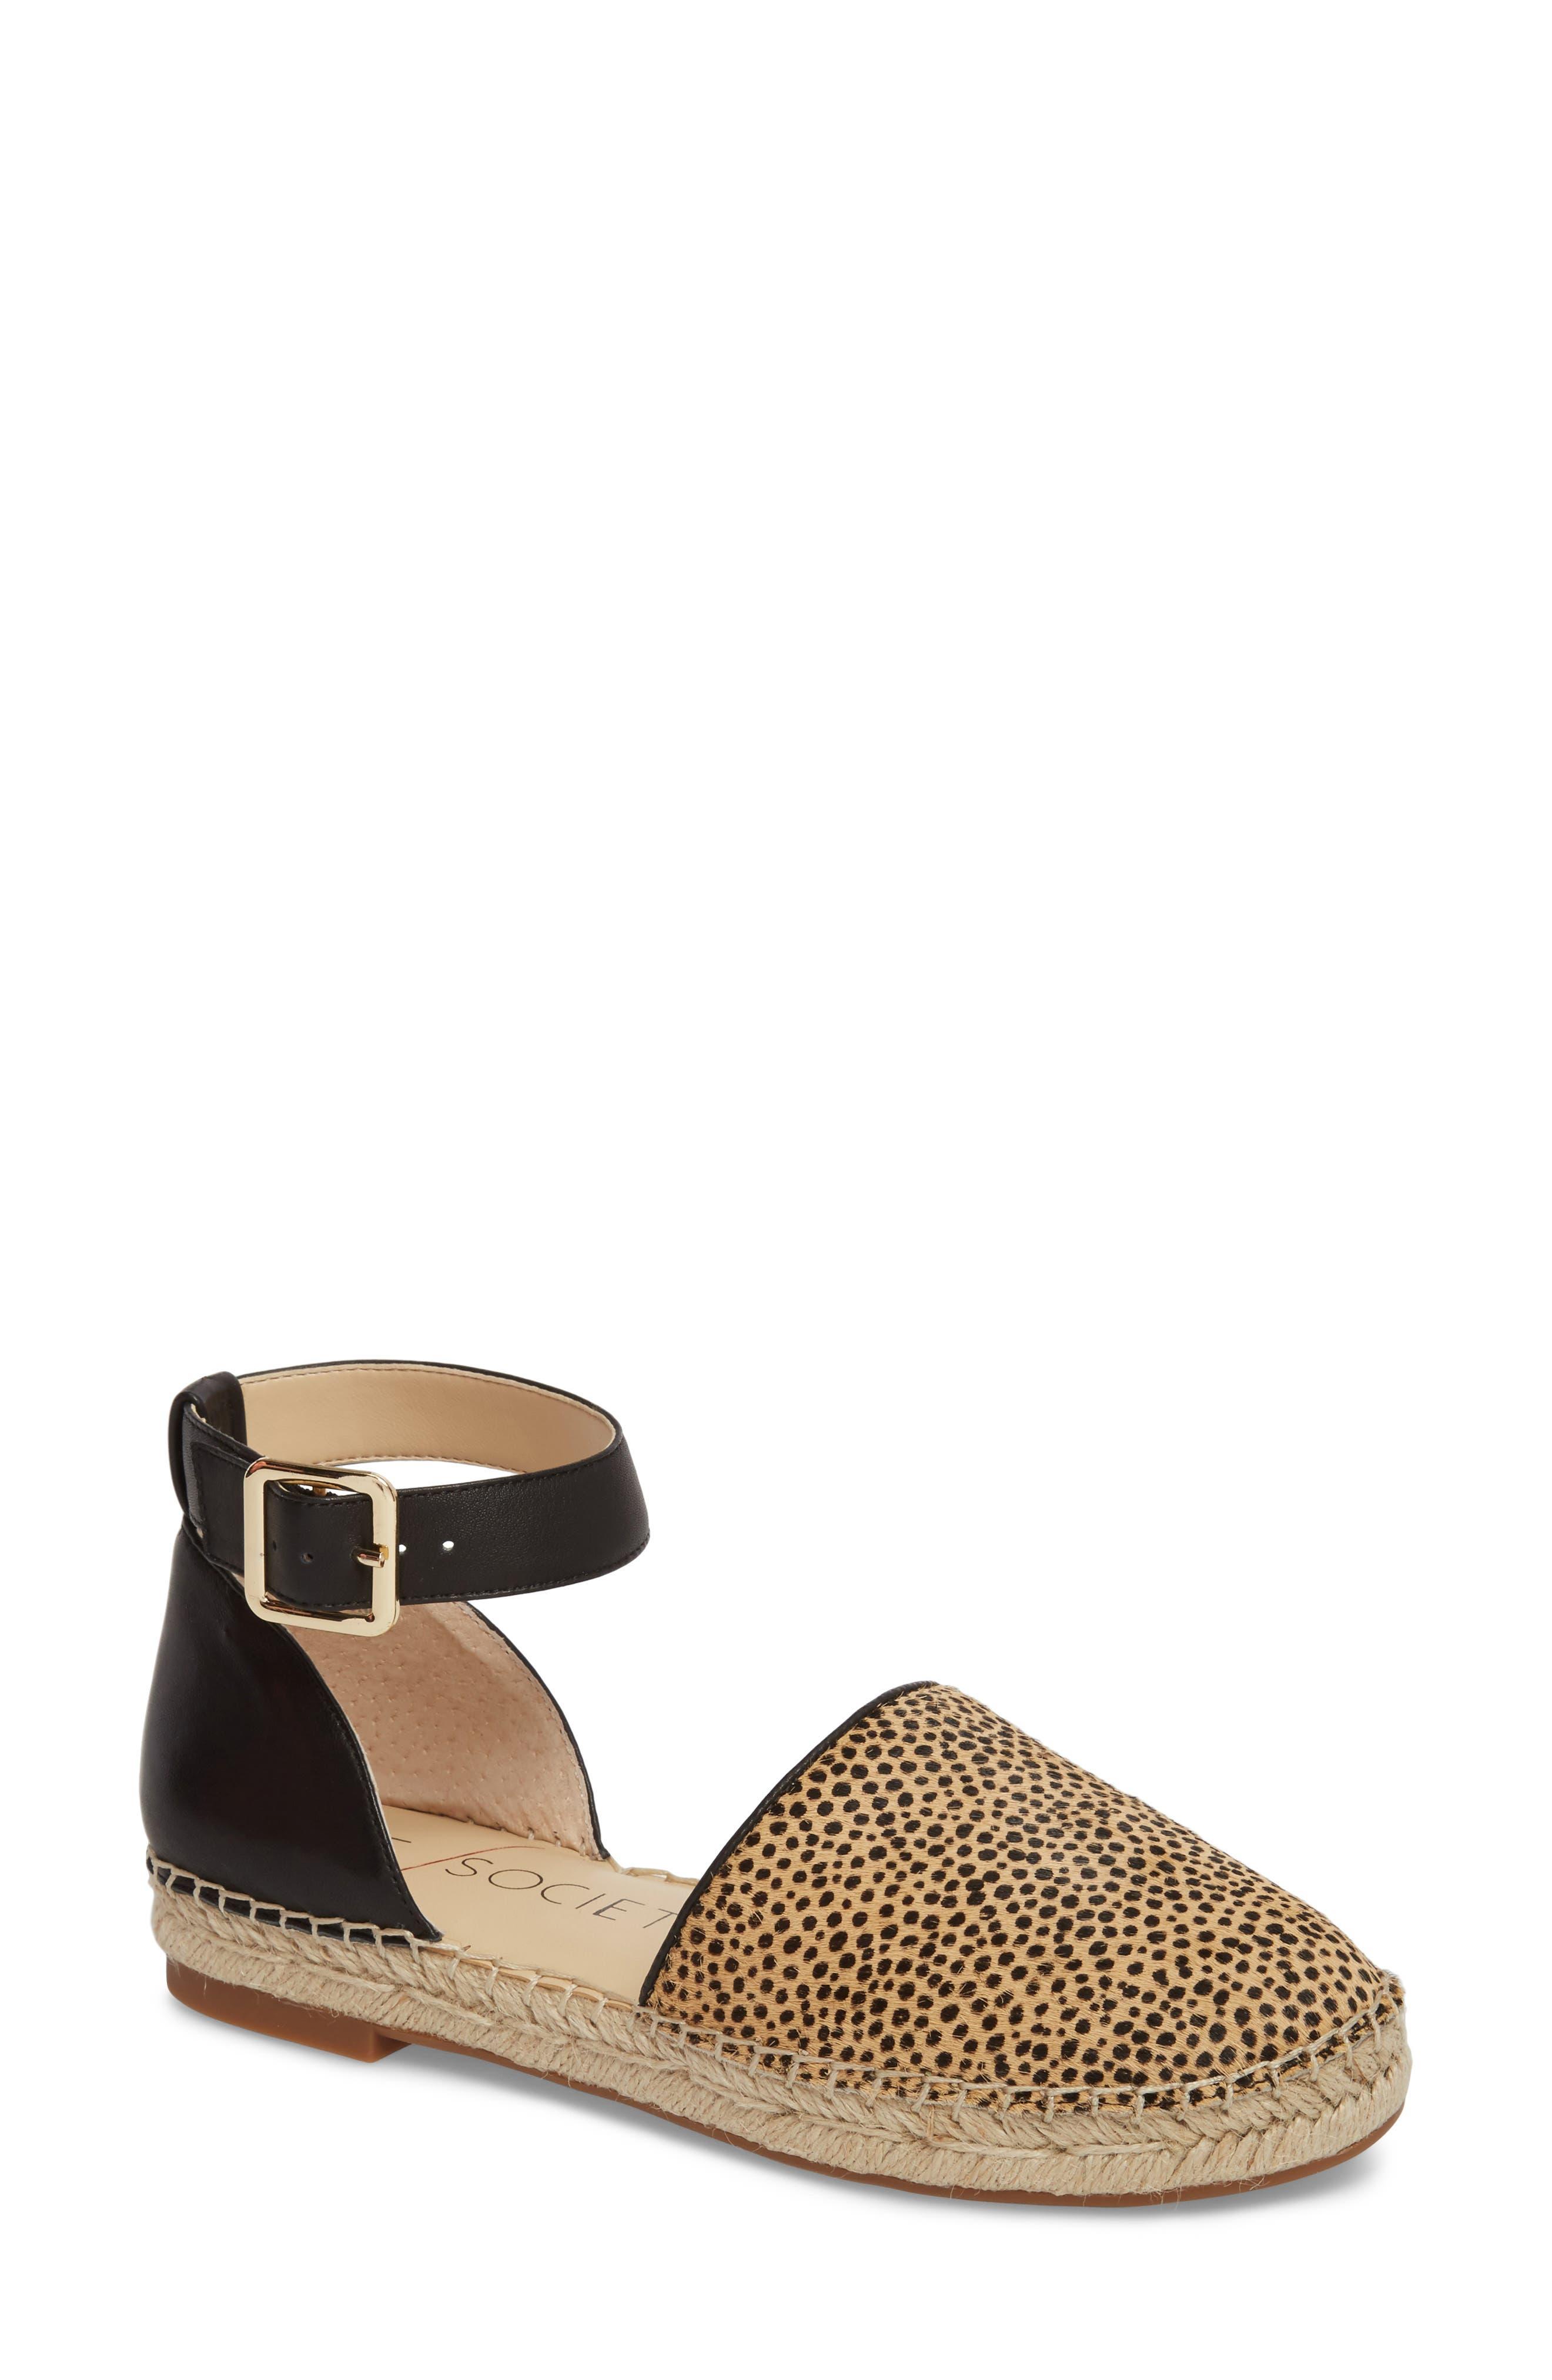 Alternate Image 1 Selected - Sole Society Stacie Genuine Calf Hair Espadrille Sandal (Women)